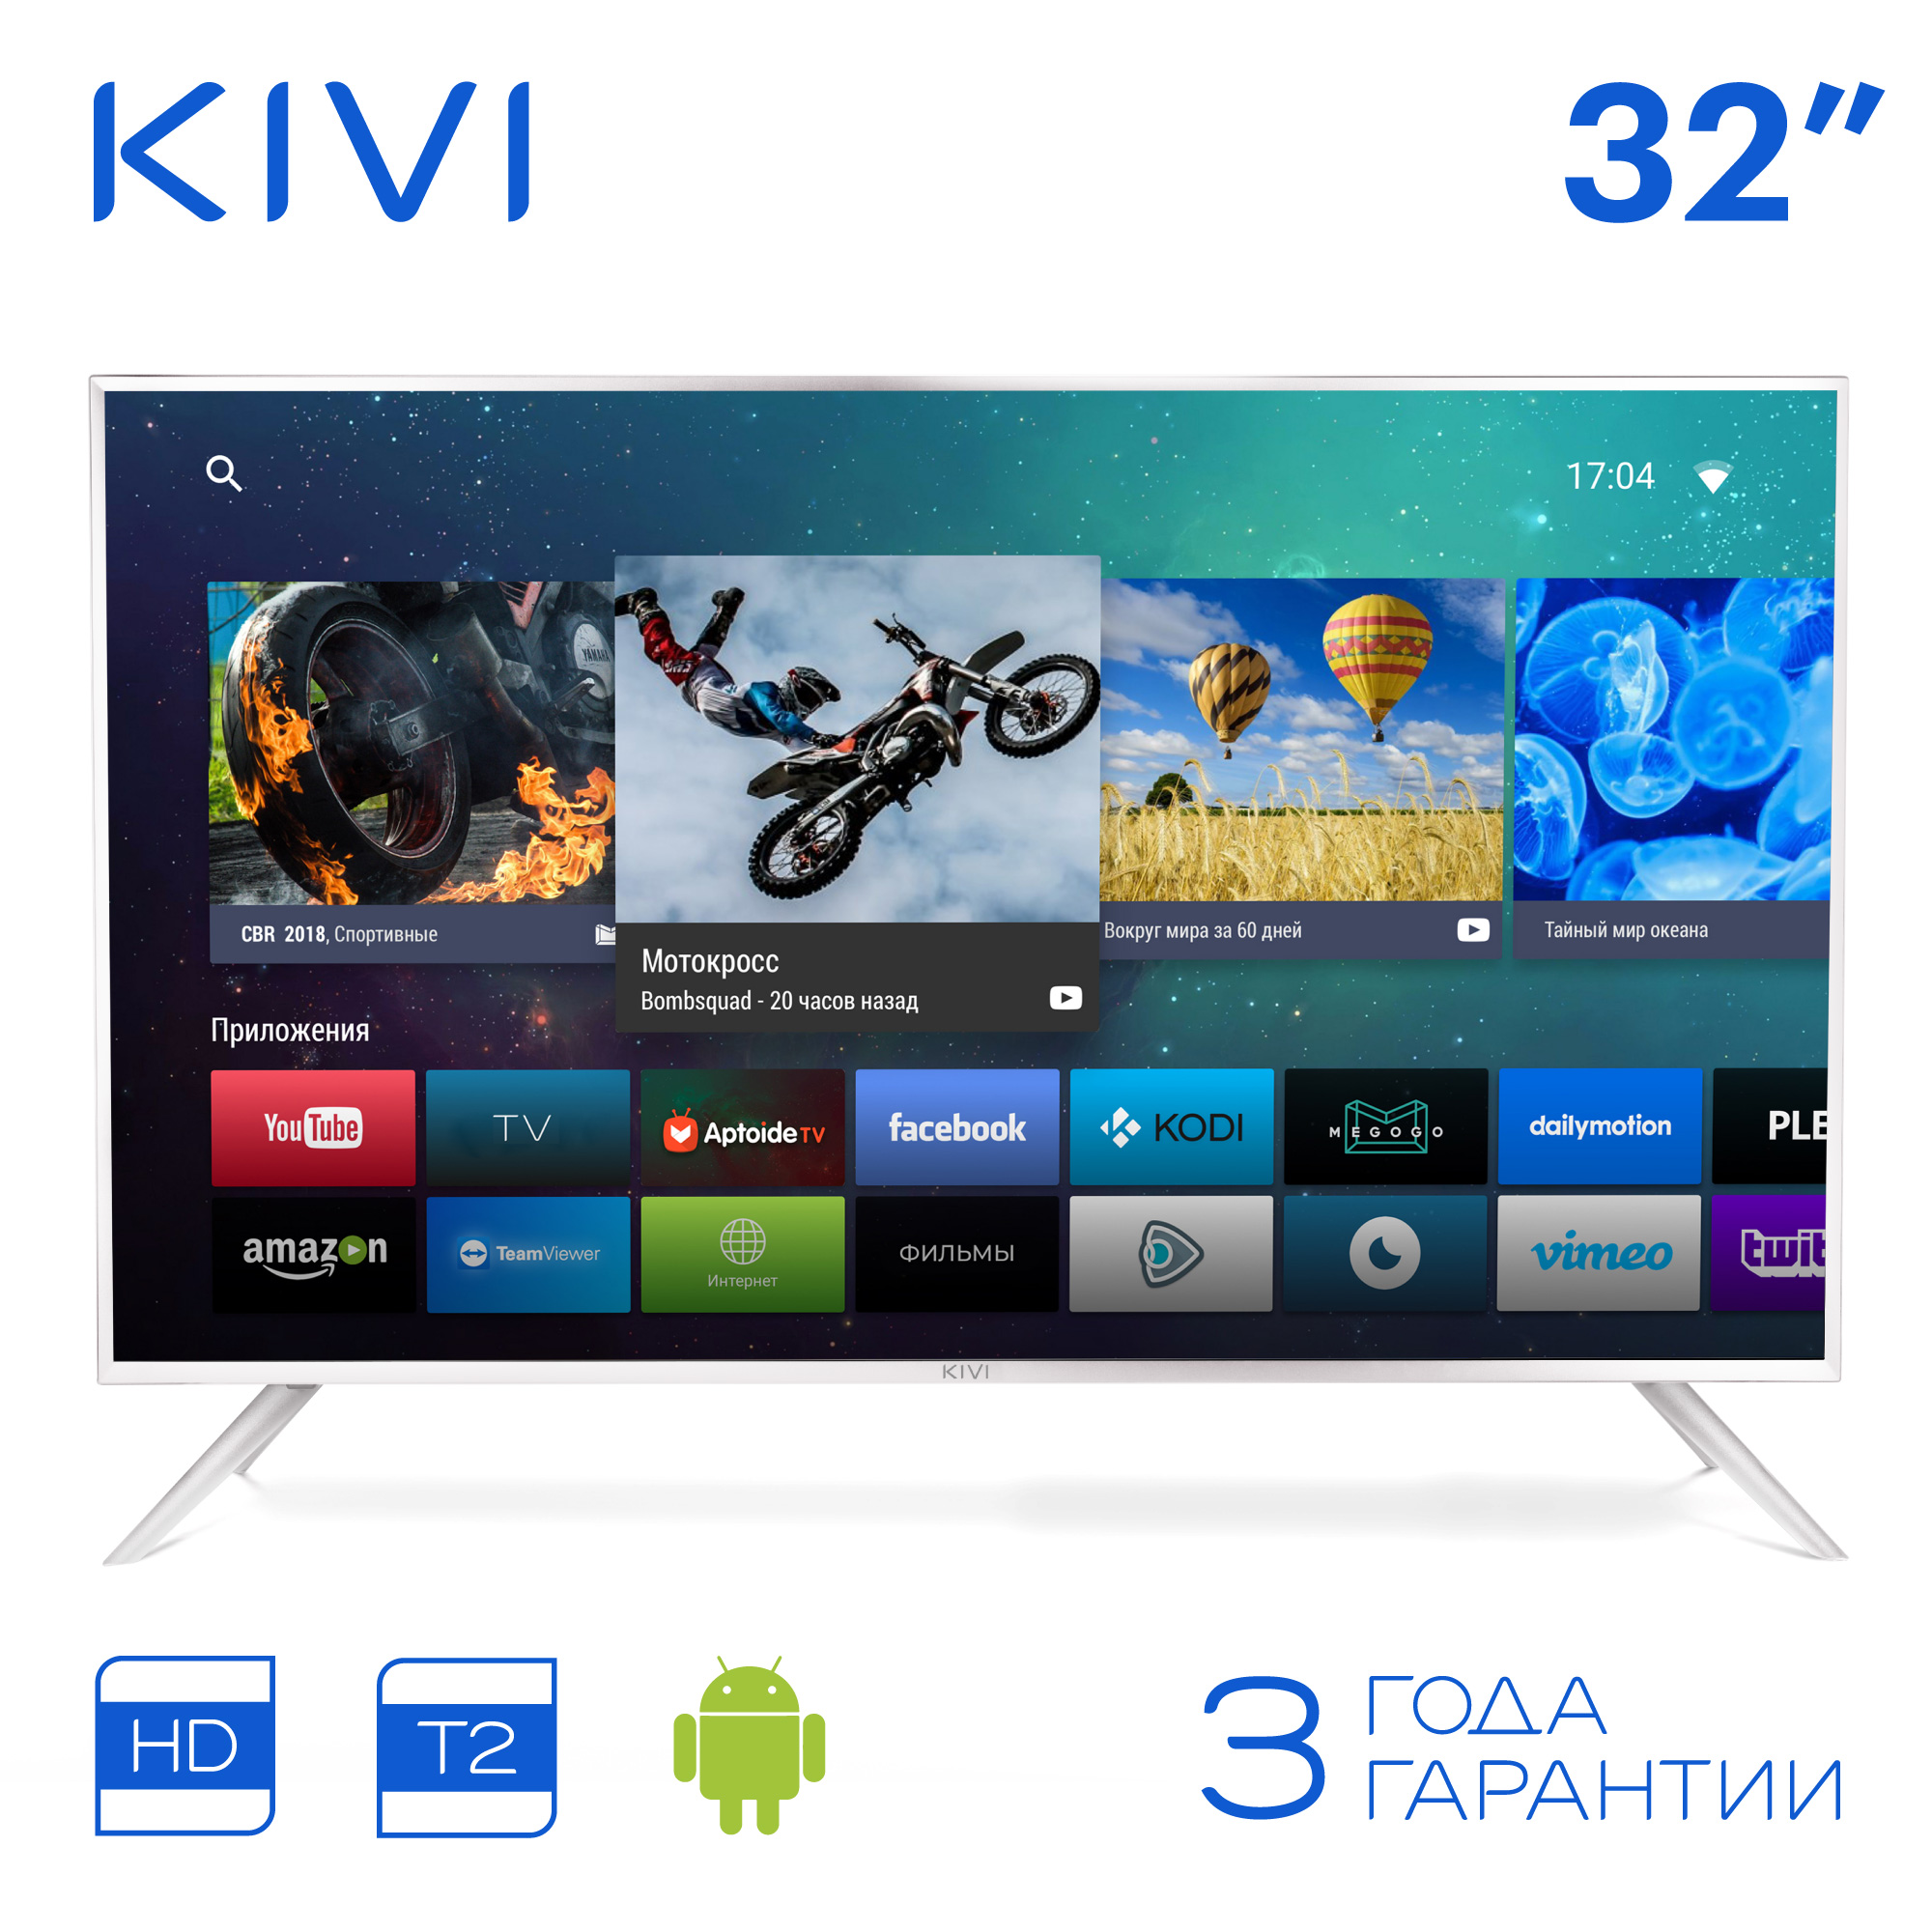 Tevê 32 kikivi 32fr52wr hd completo smart tv android hdr branco